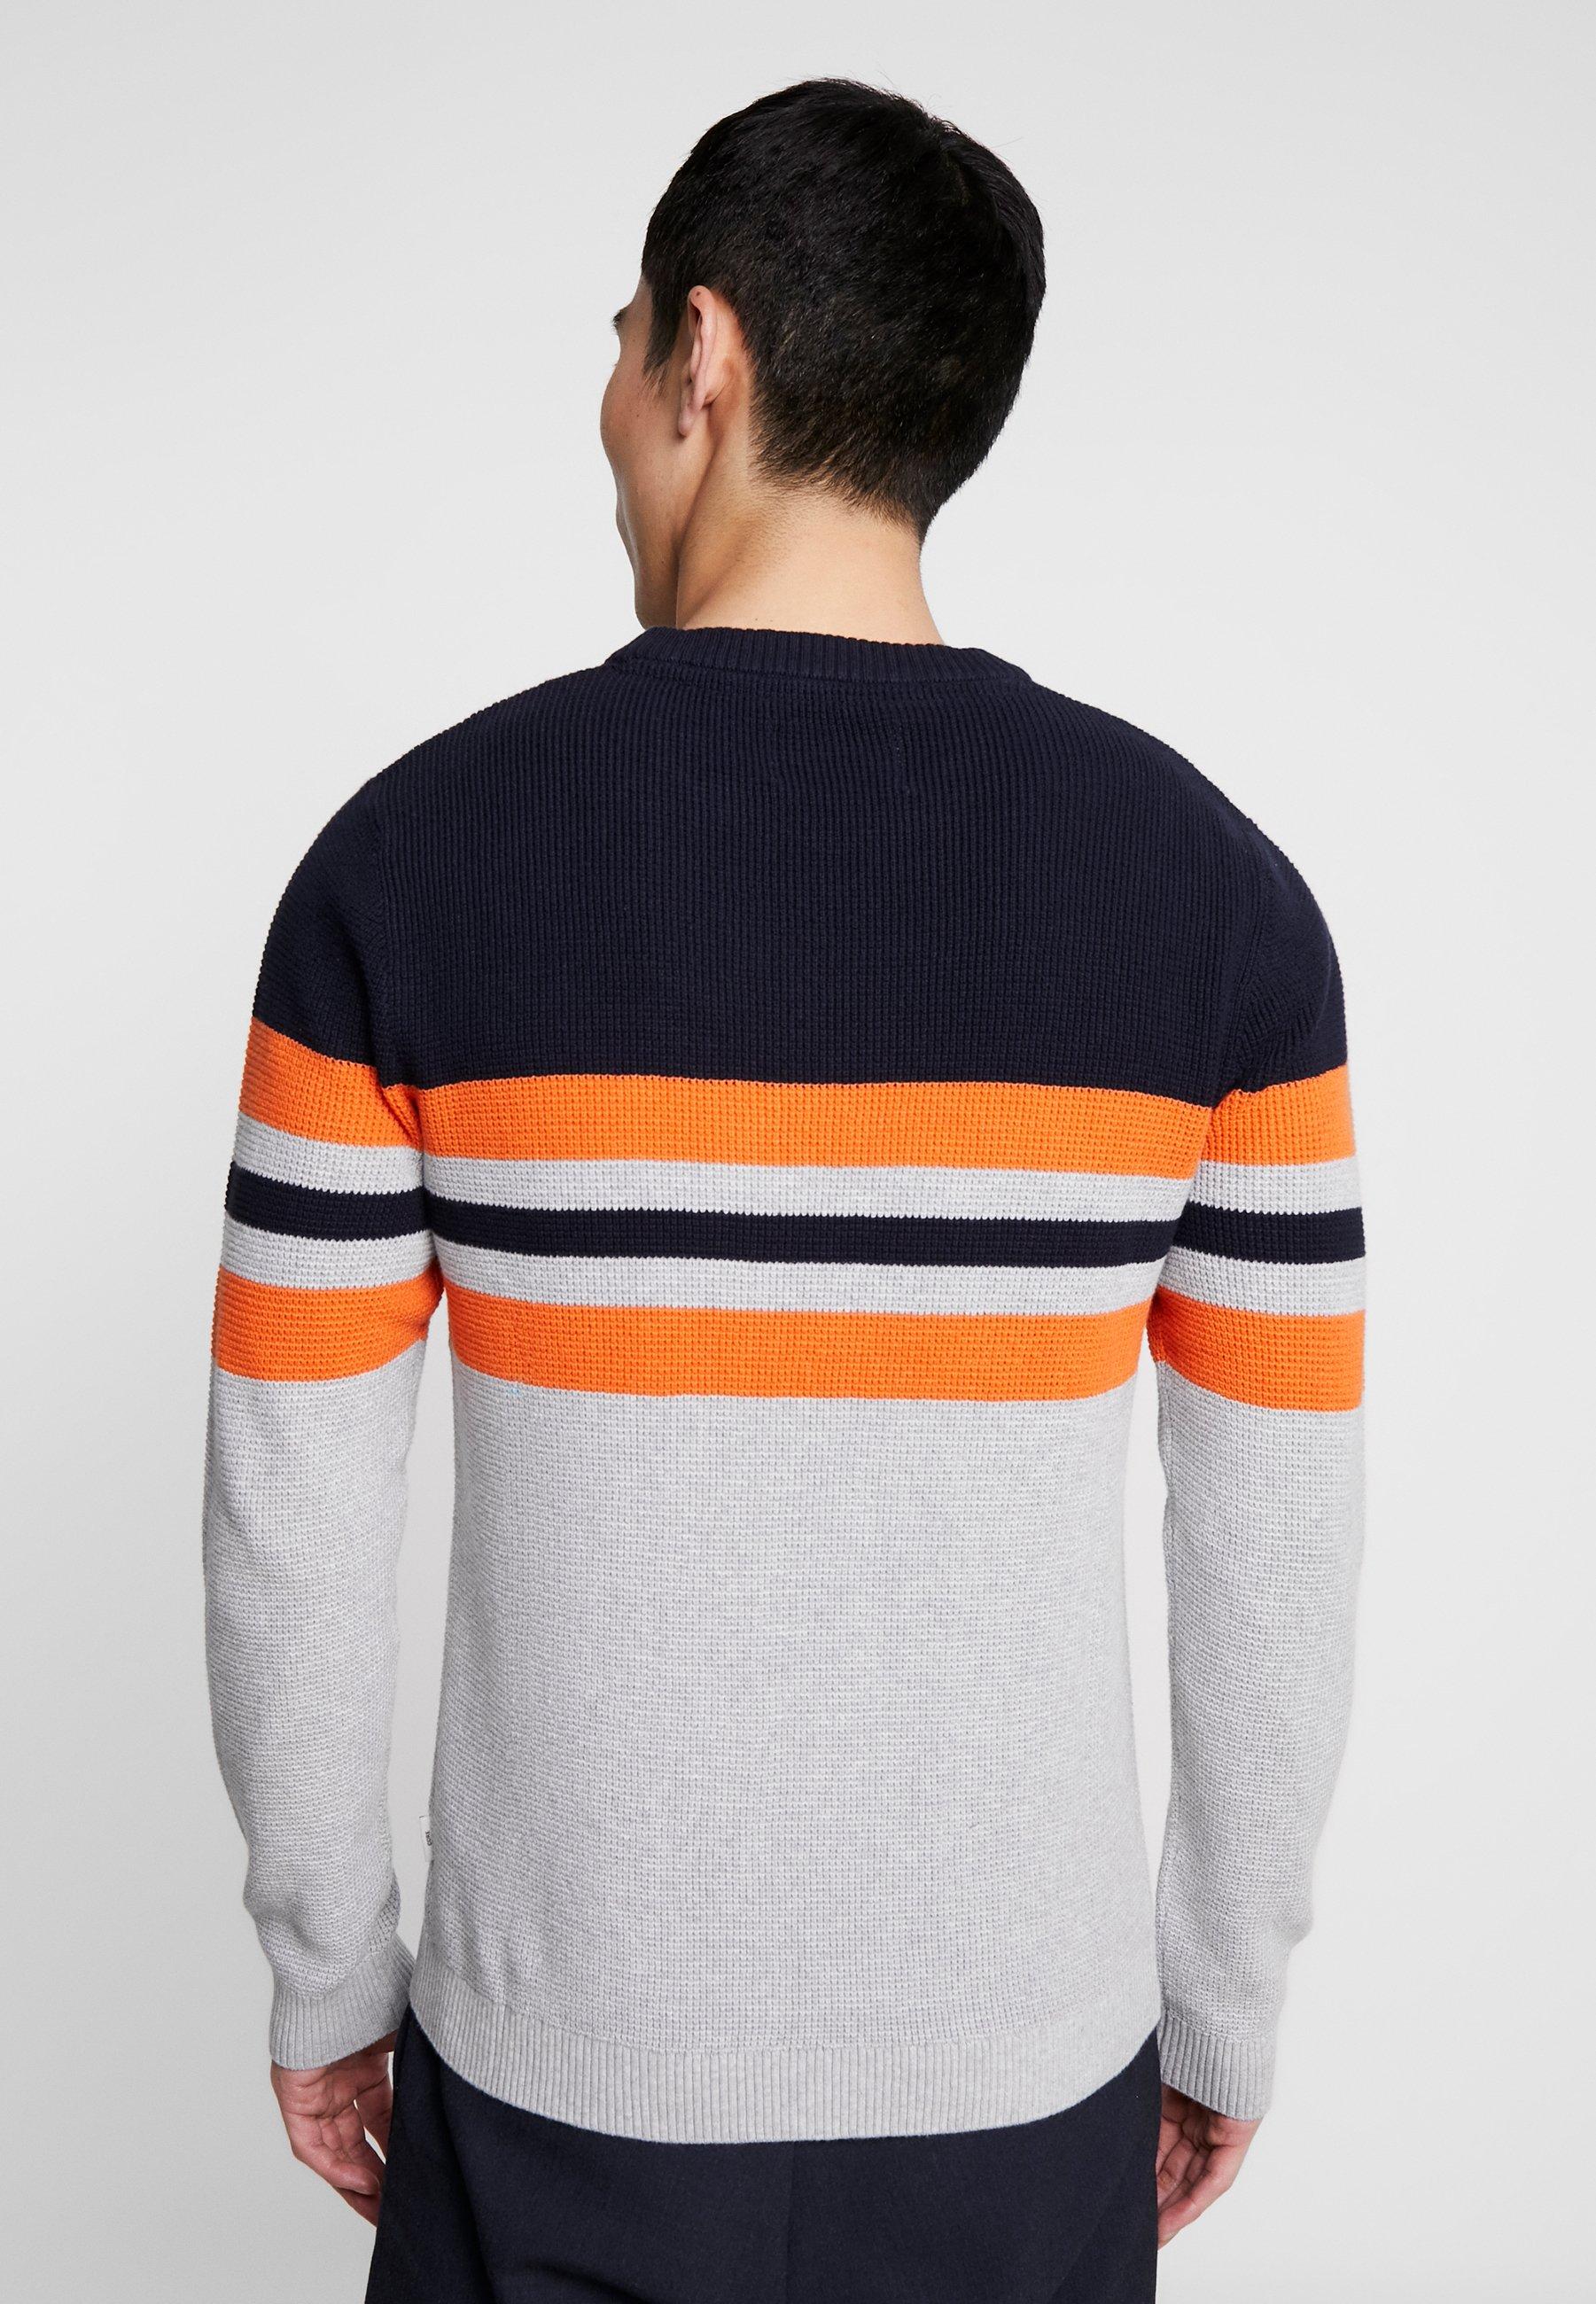 vibrant Orange Knit Jackamp; NeckPullover Jones Jconewoak Captain Crew Sky FKcTl1J